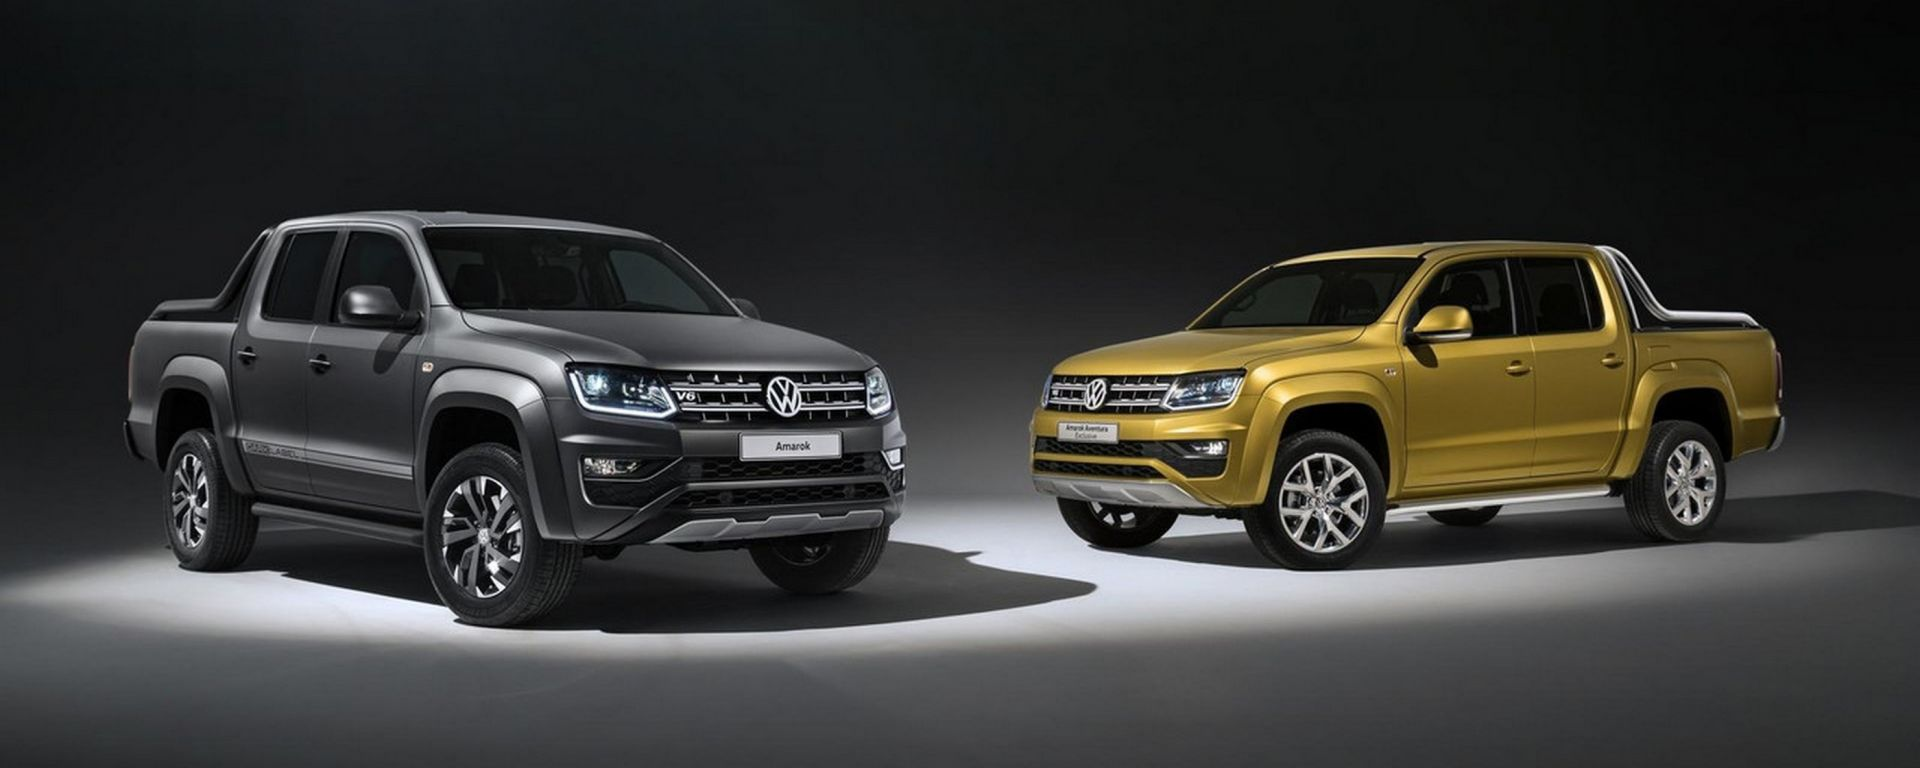 Volkswagen Amarok: un restyling e una concept a Francoforte 2017